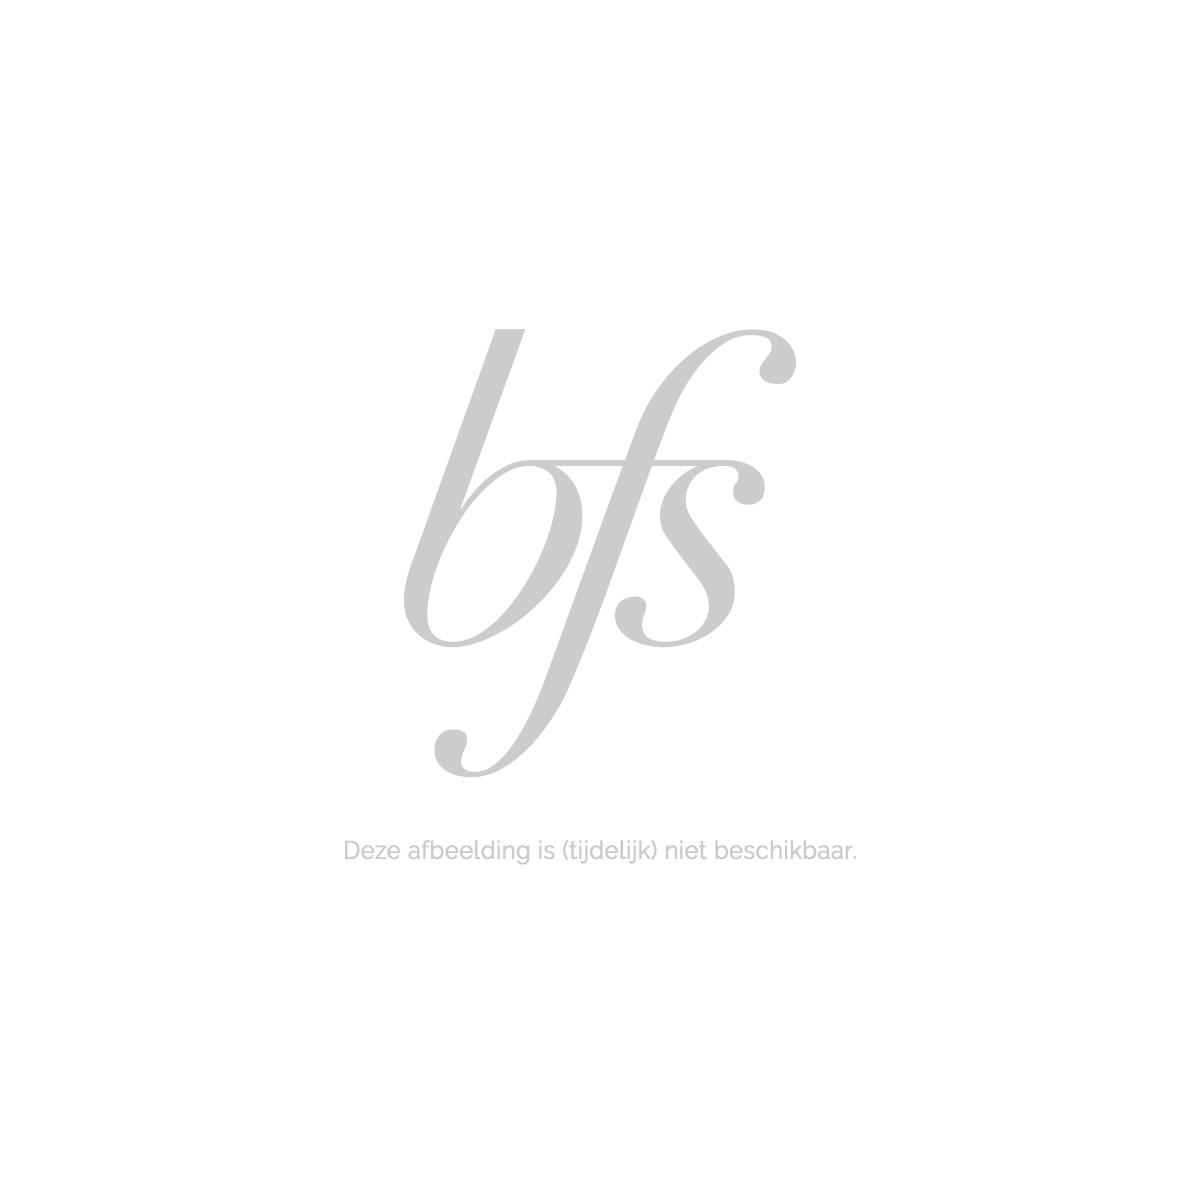 Biosilk Summer Therapy Protective Haarolie 167 Ml